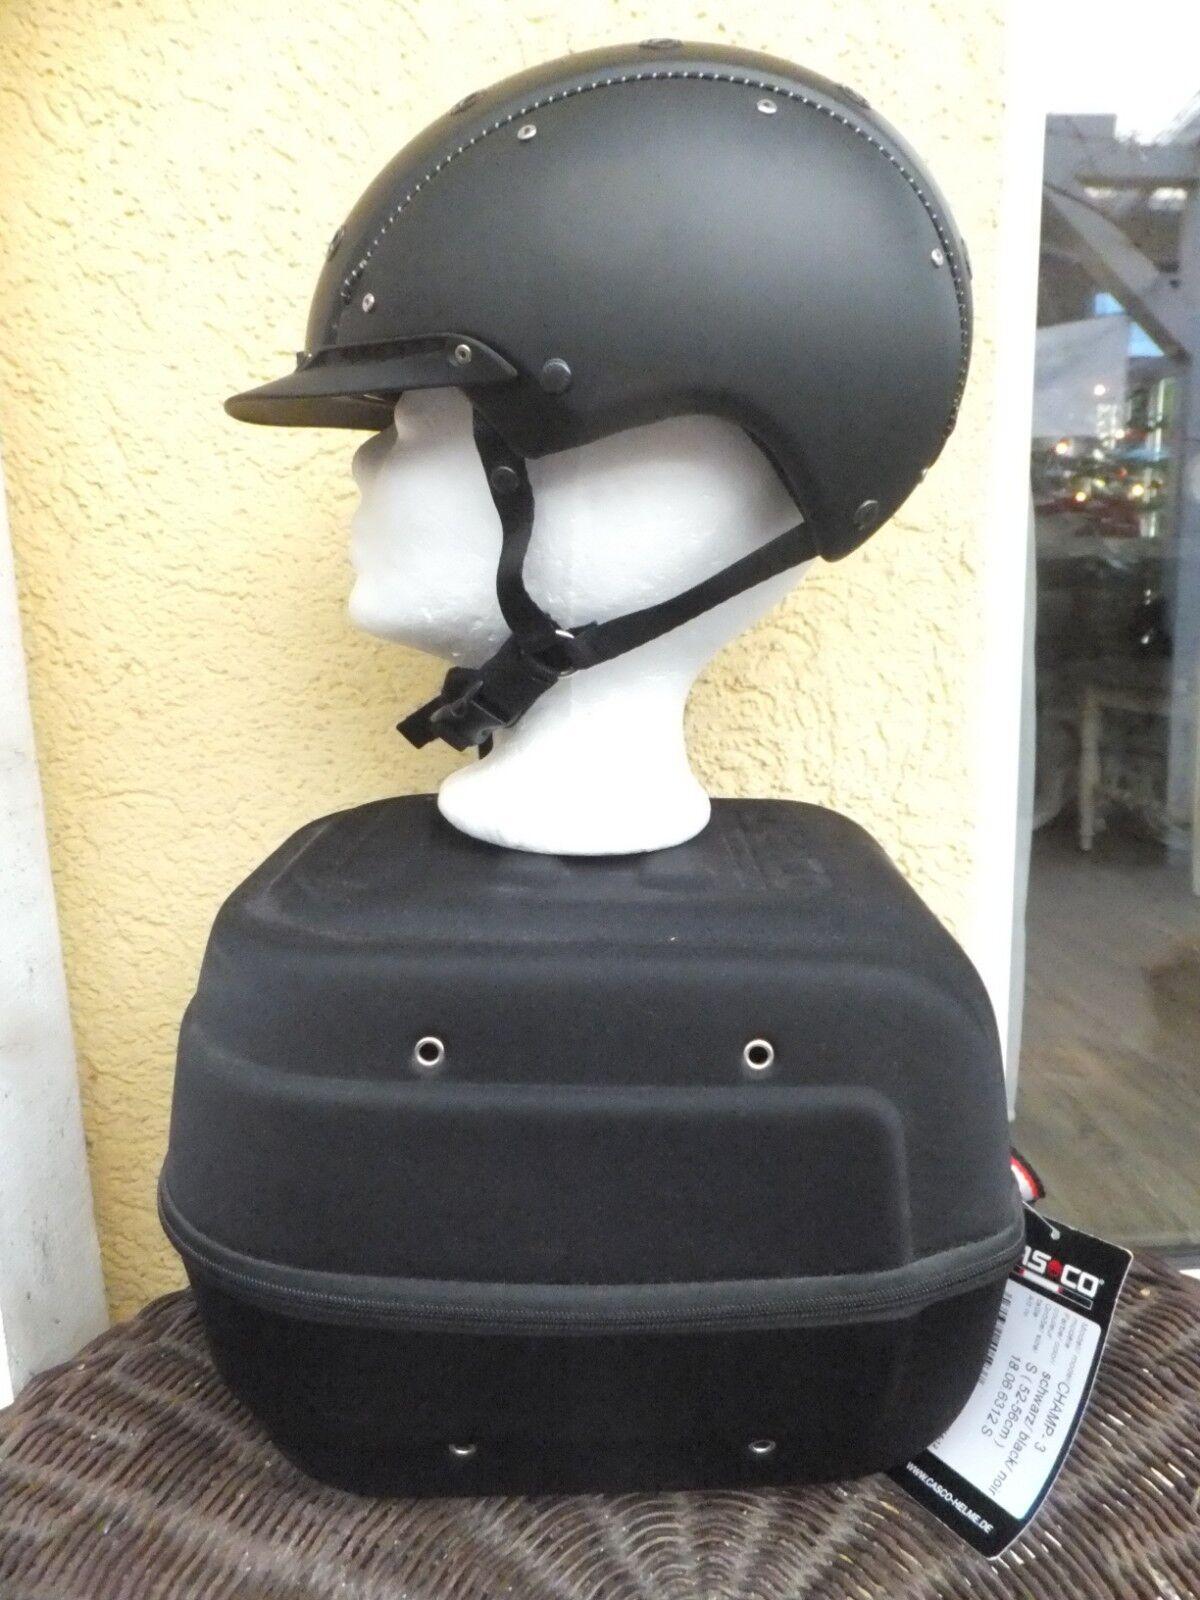 nuevos  casco Champ 3 negro reithelm nuevo modelo con My Style